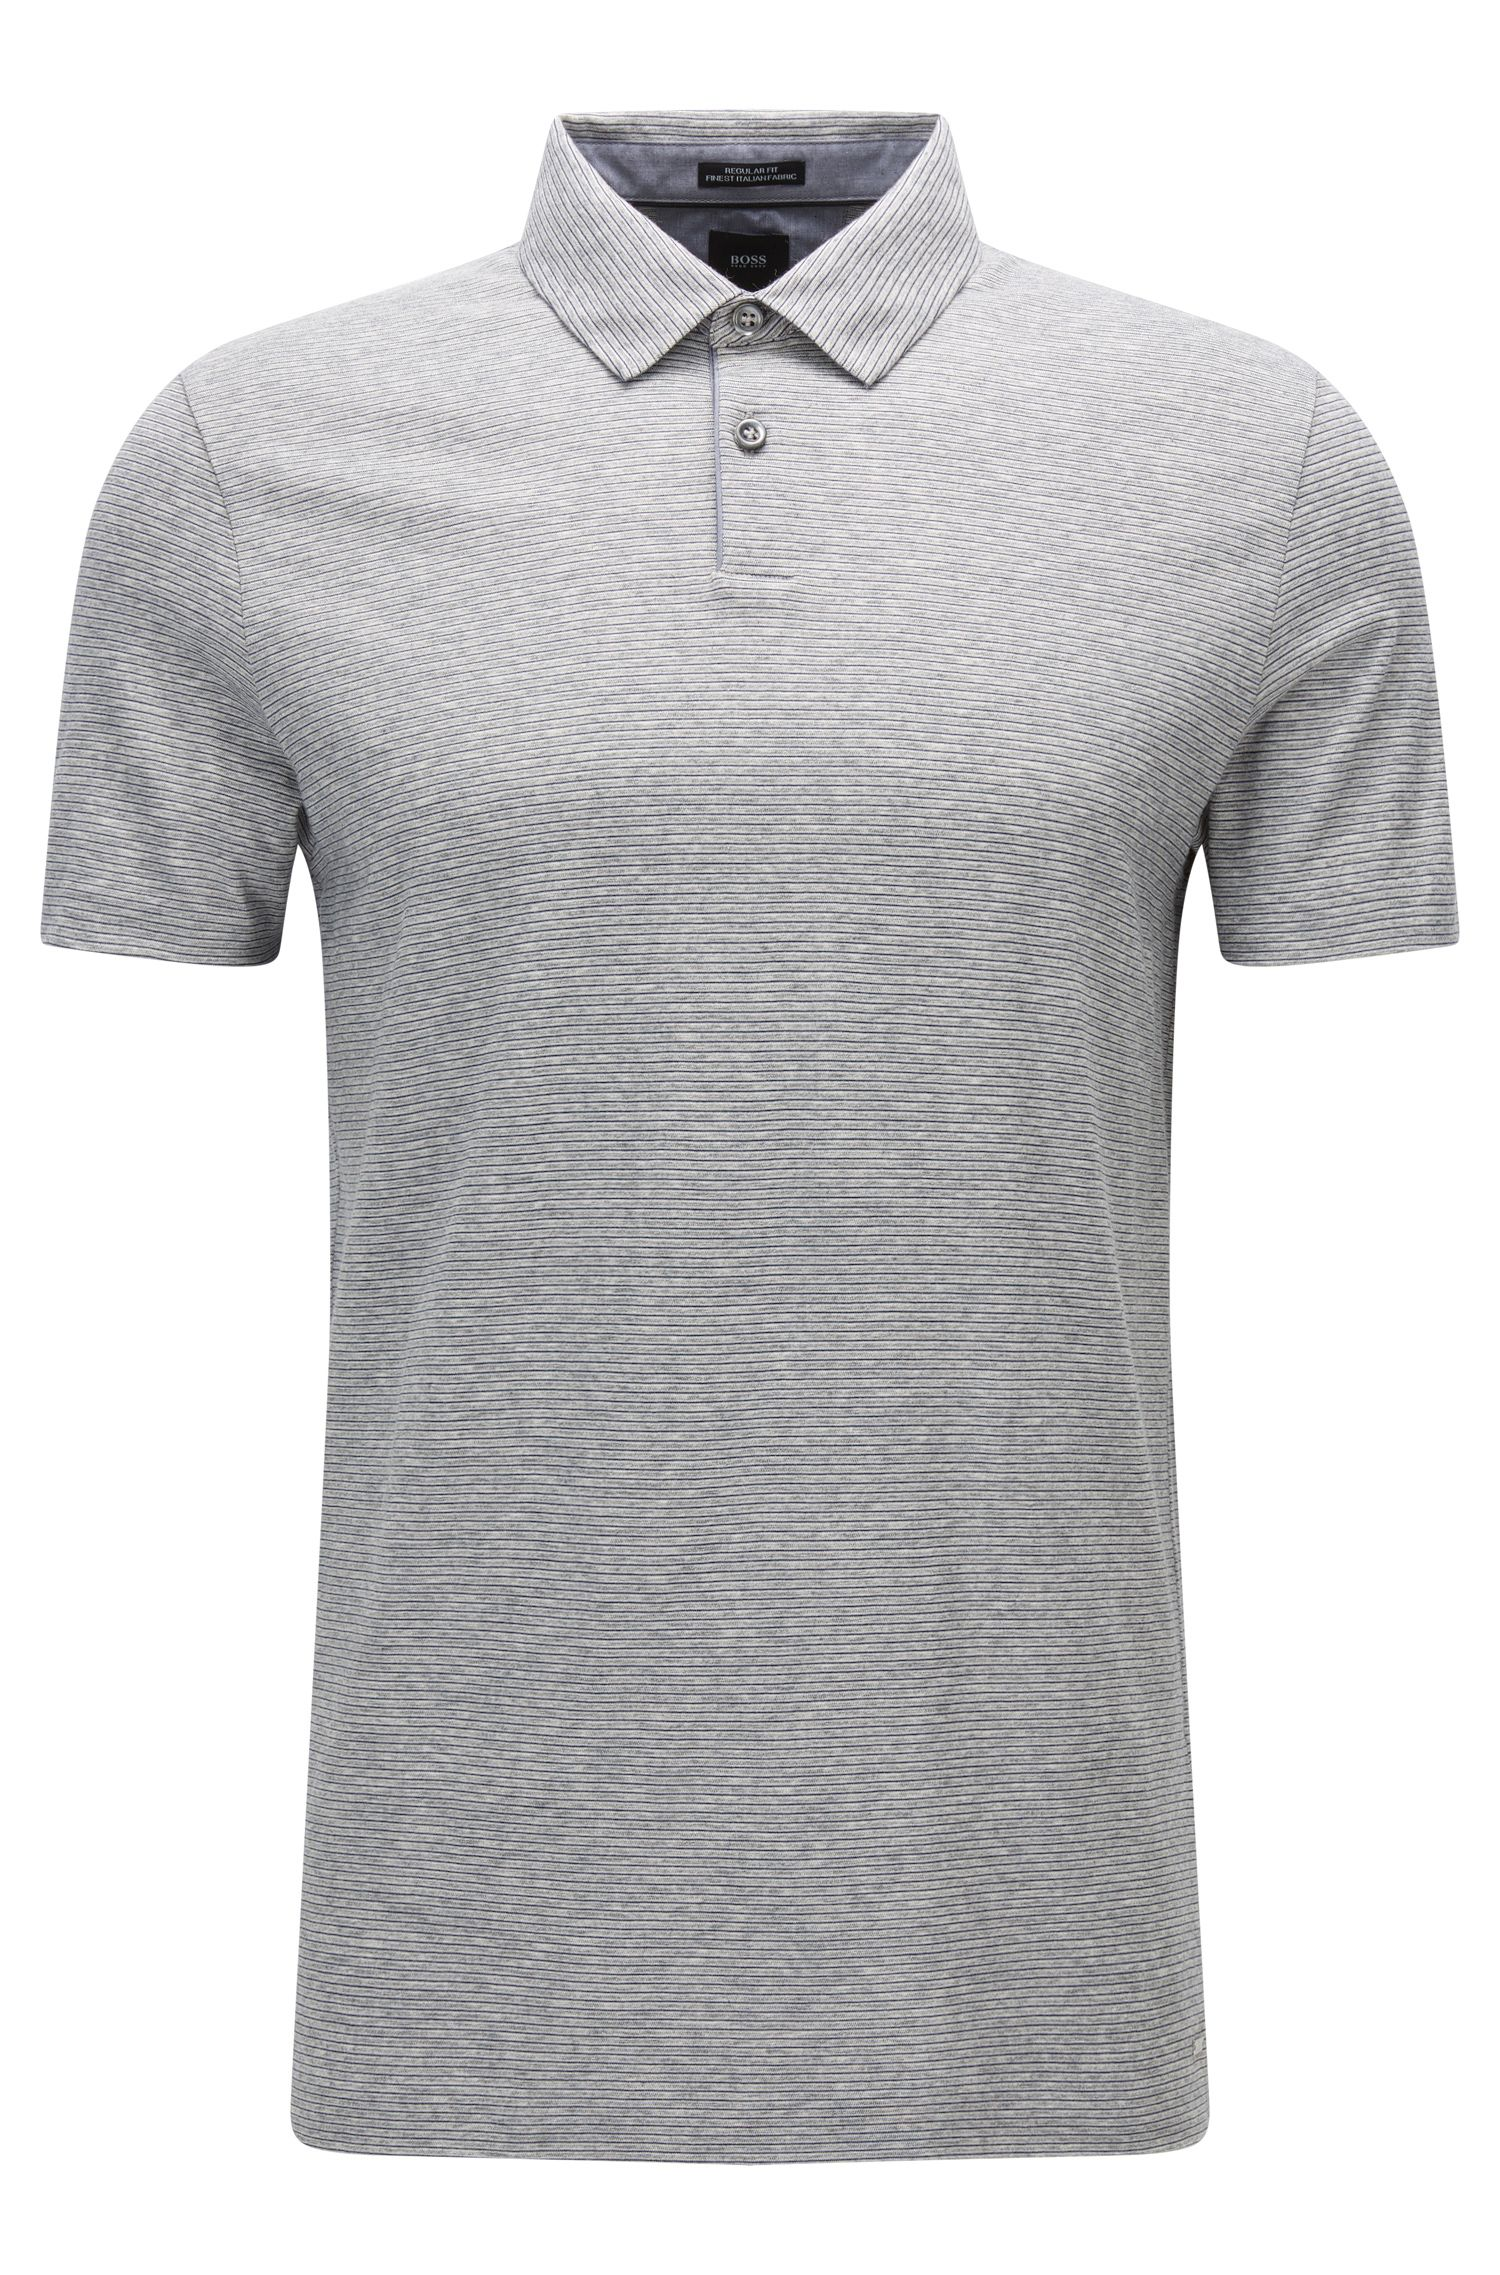 Regular-Fit Poloshirt aus Baumwolle in Denim-Optik